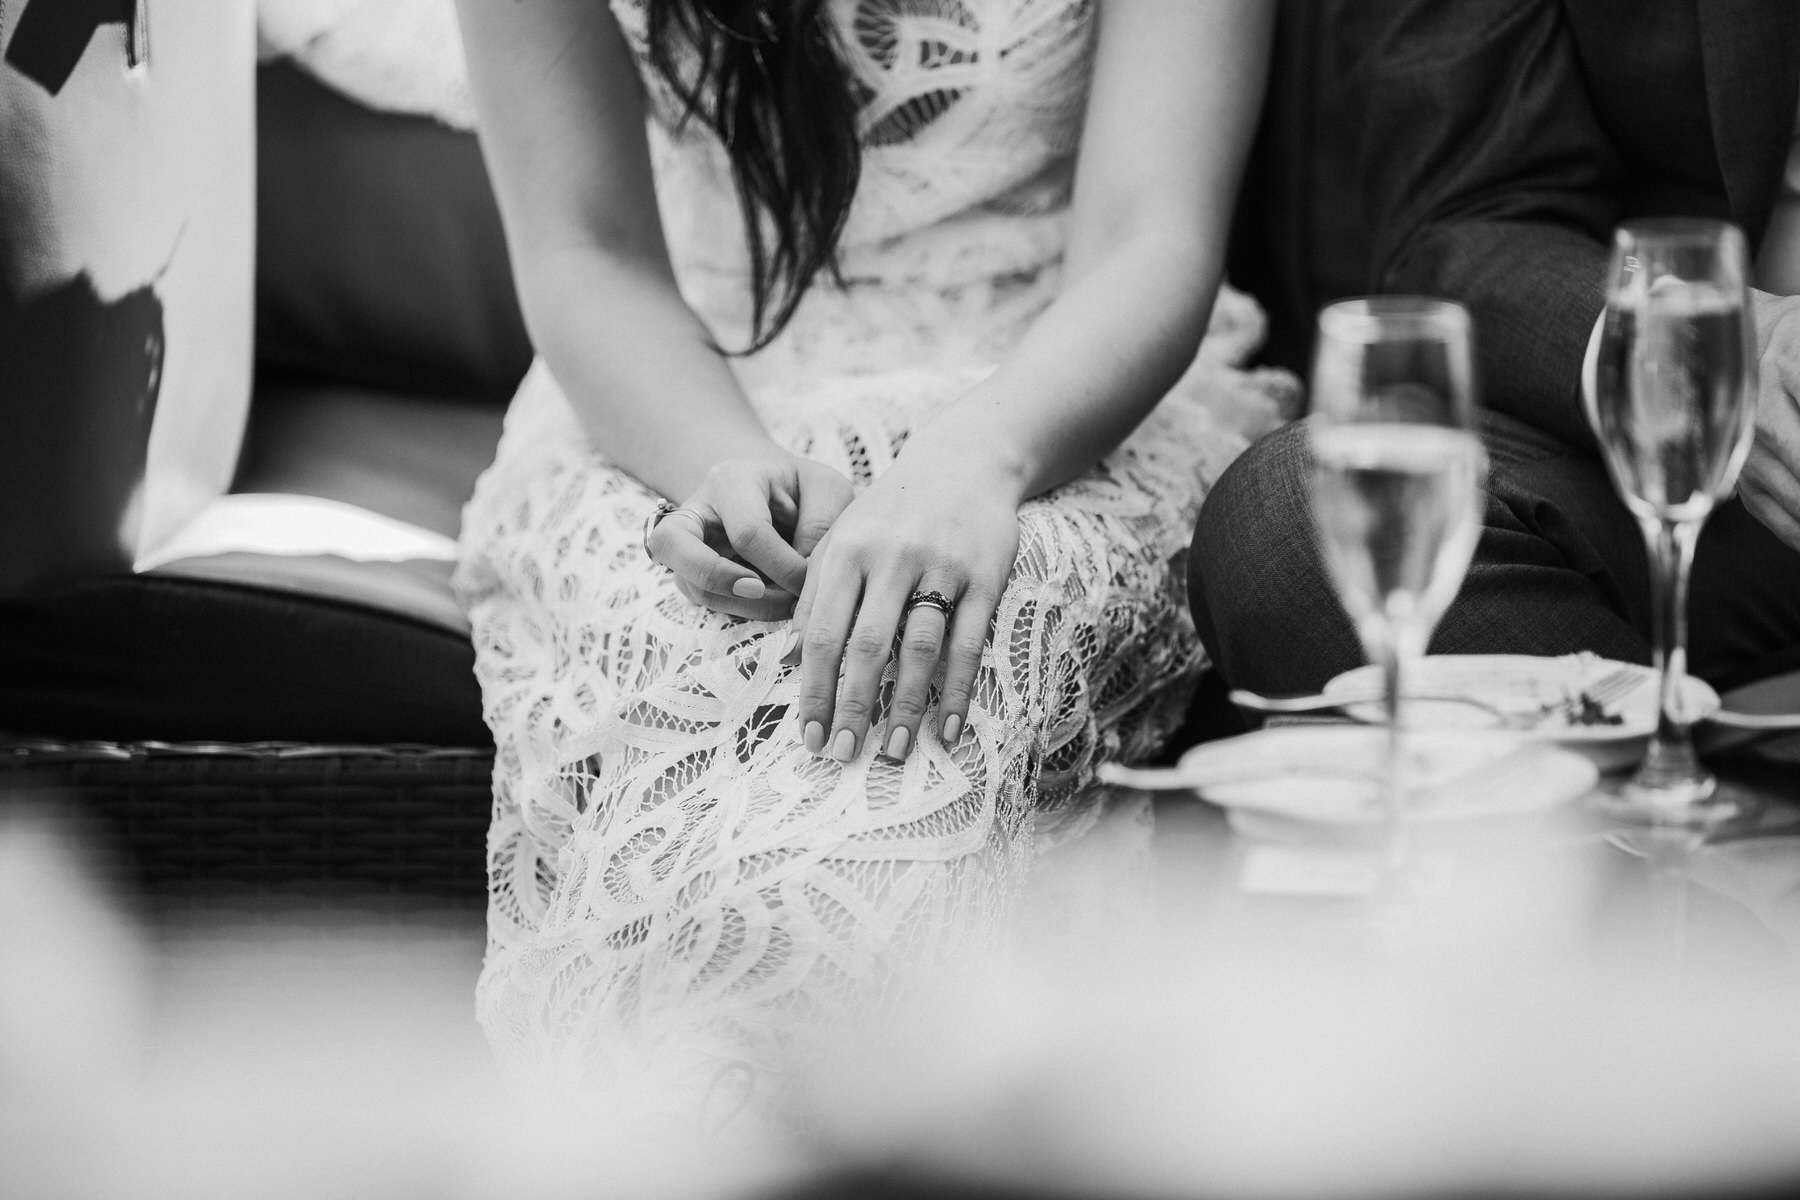 612 BW detail shot brides wedding ring against lace dress.jpg